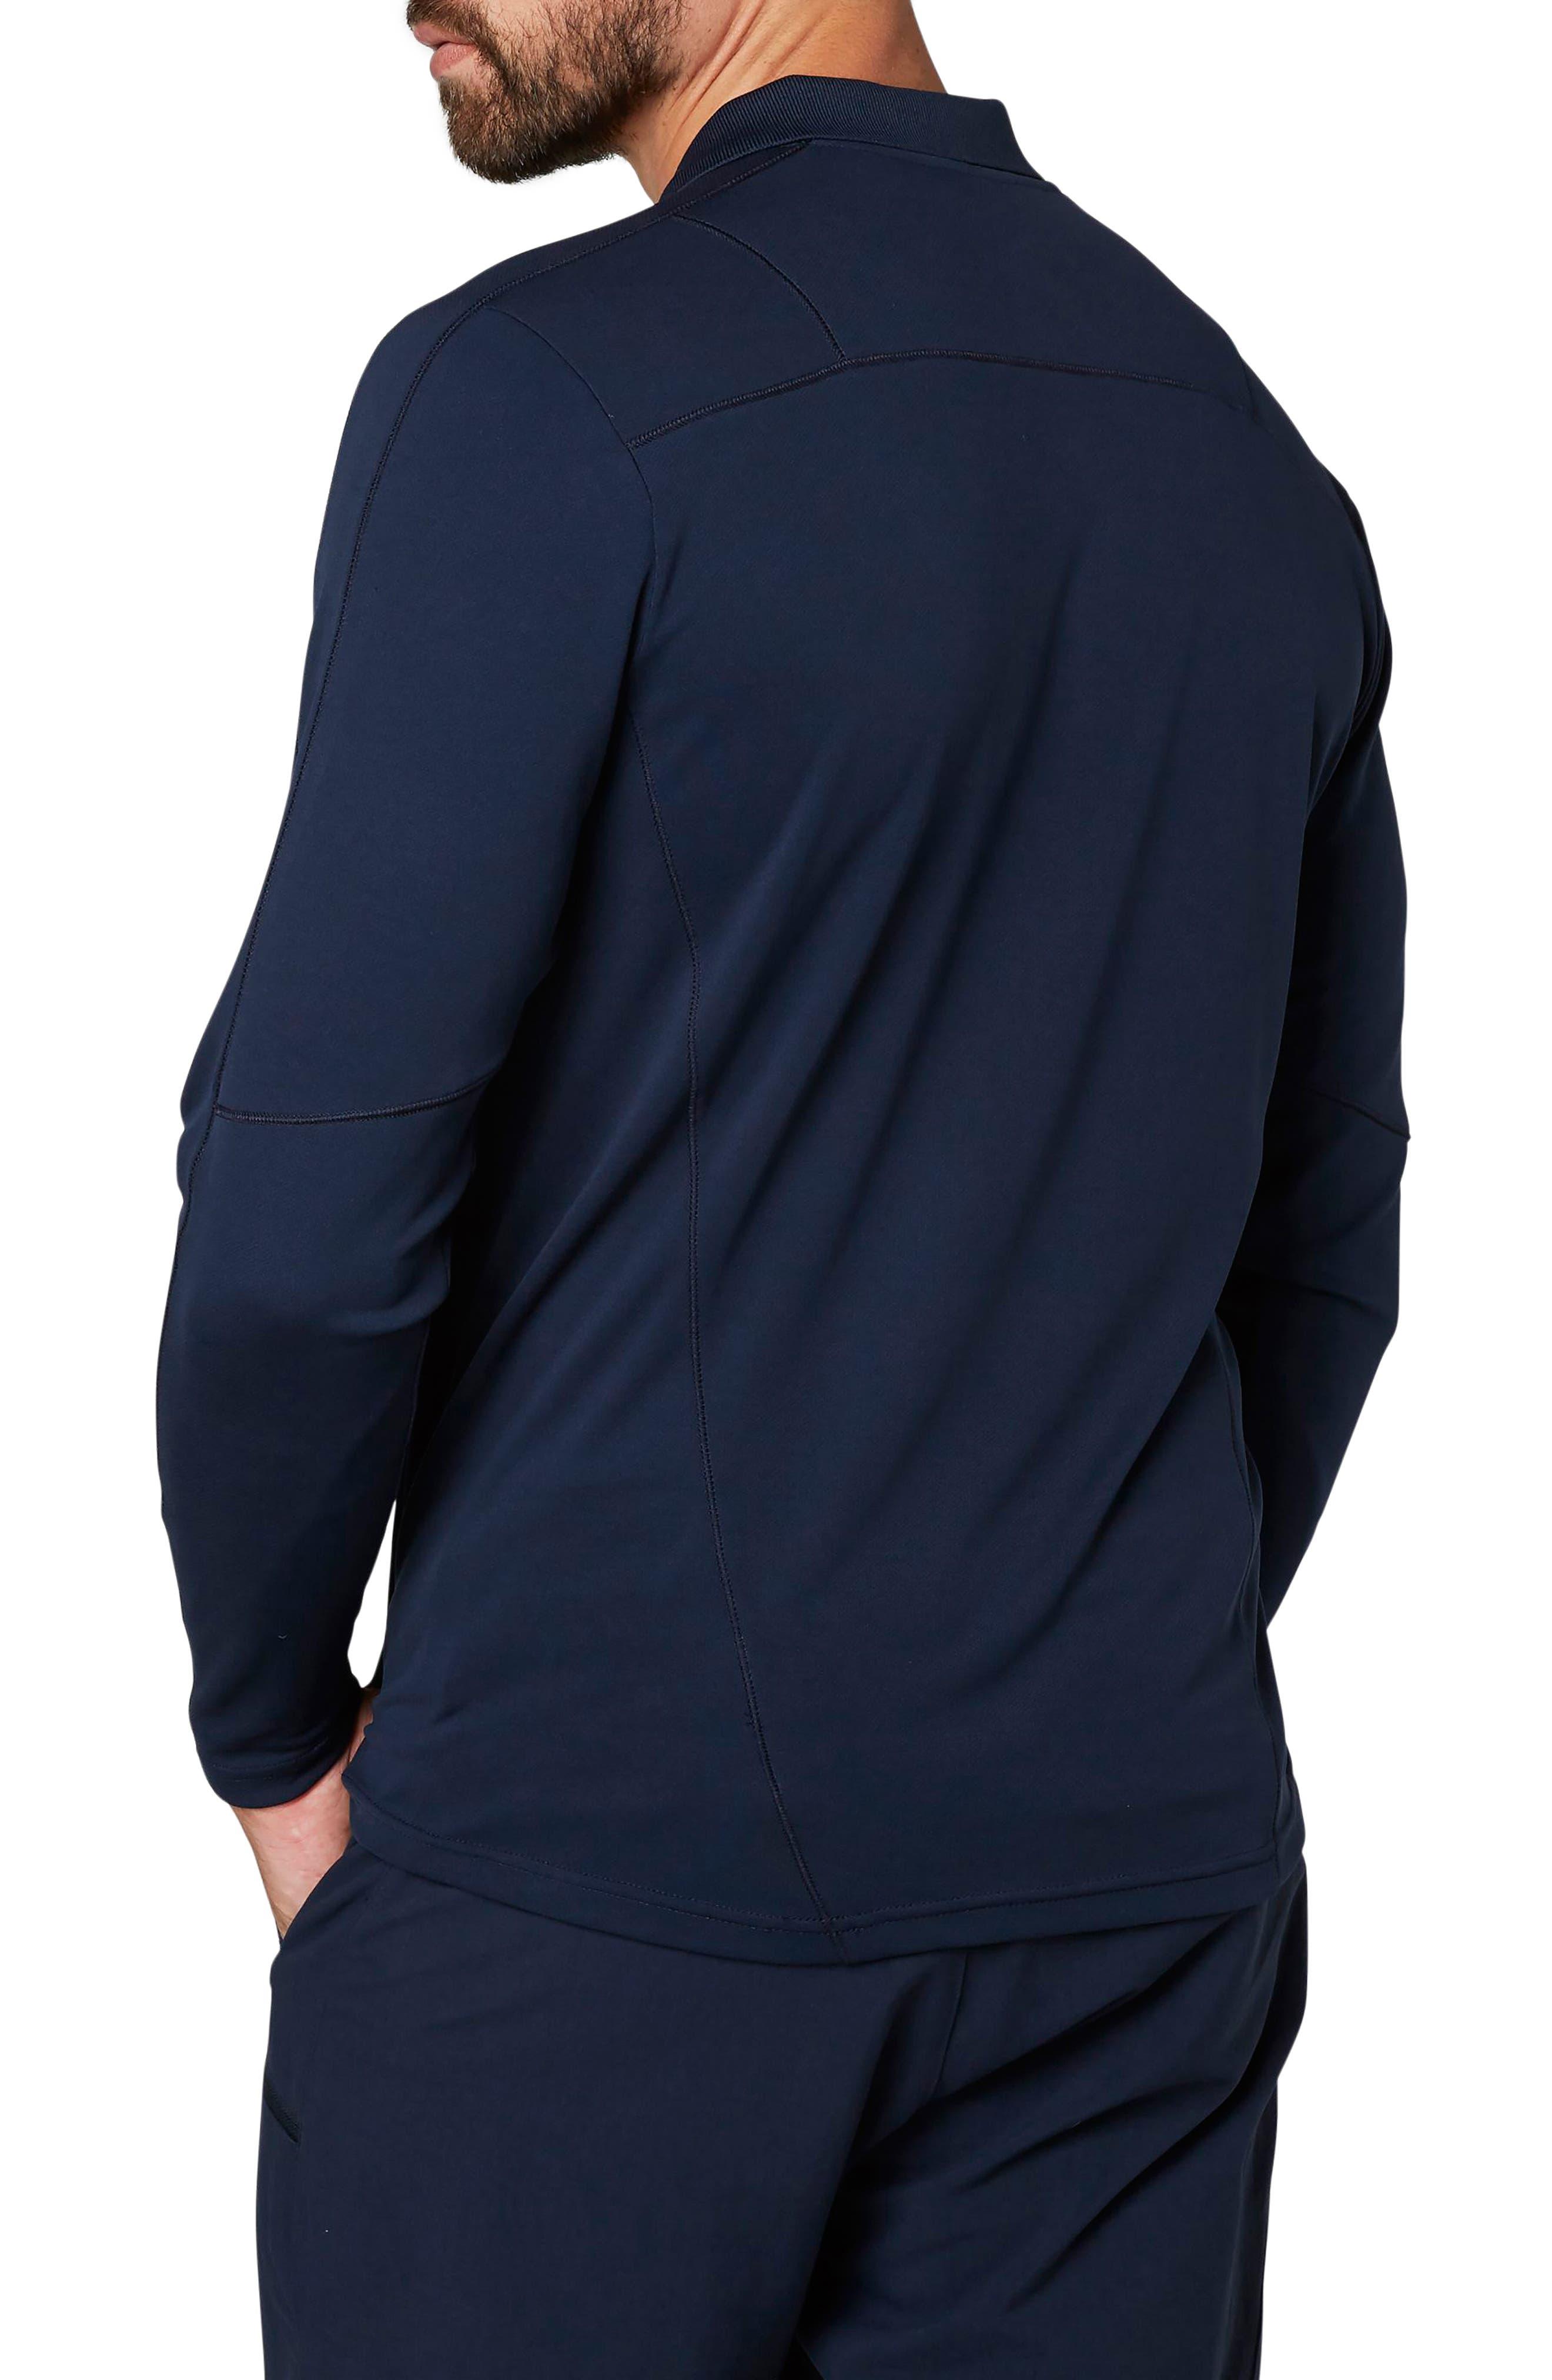 HH<sup>®</sup> Lifa Active Light Long Sleeve Polo Shirt,                             Alternate thumbnail 2, color,                             Navy